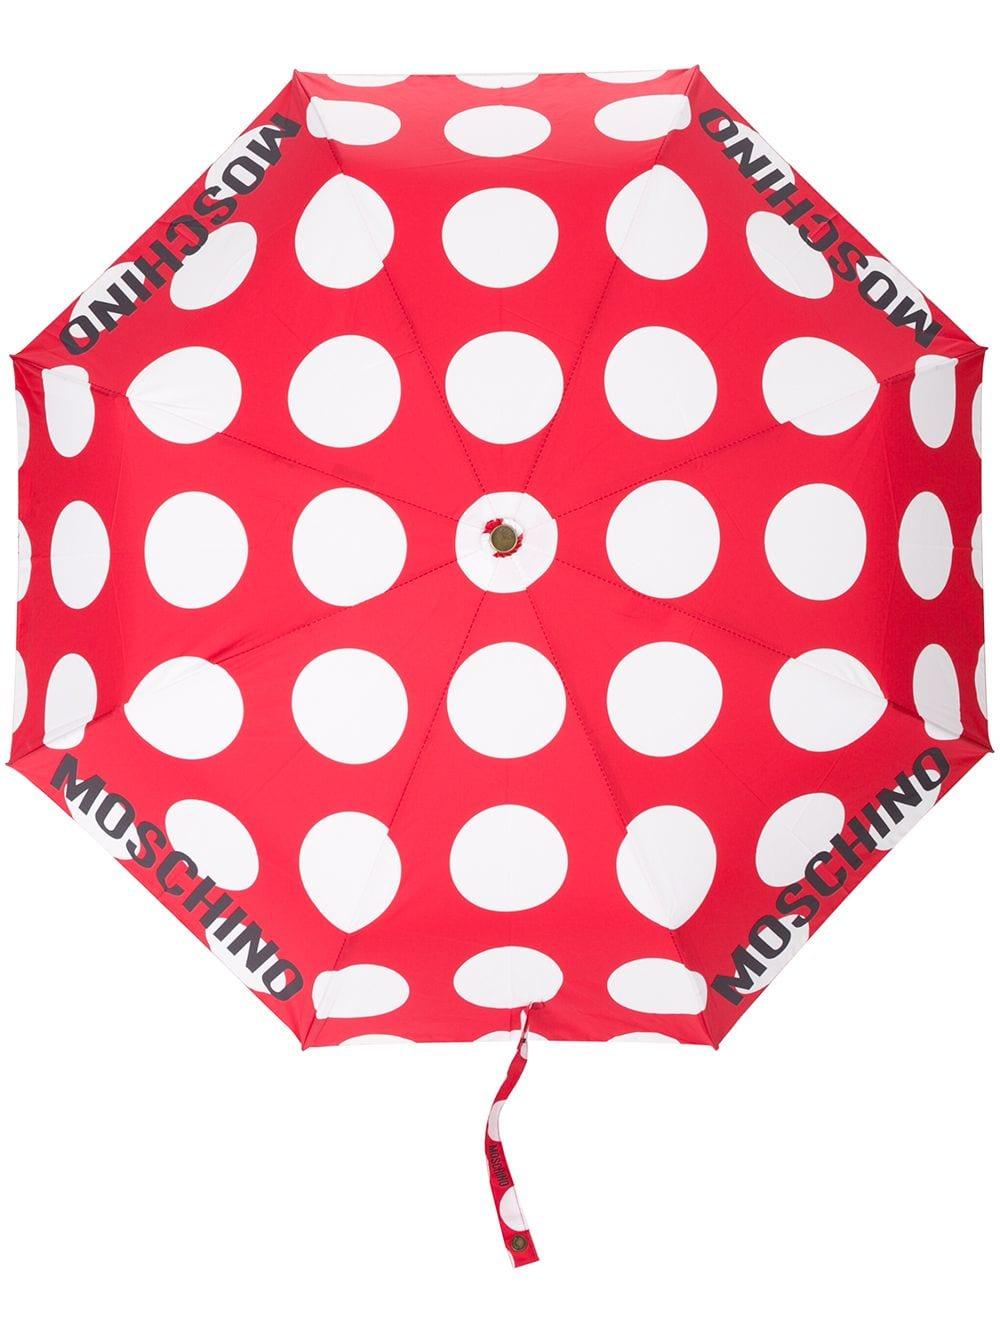 Moschino Gepunkteter Regenschirm - Rot